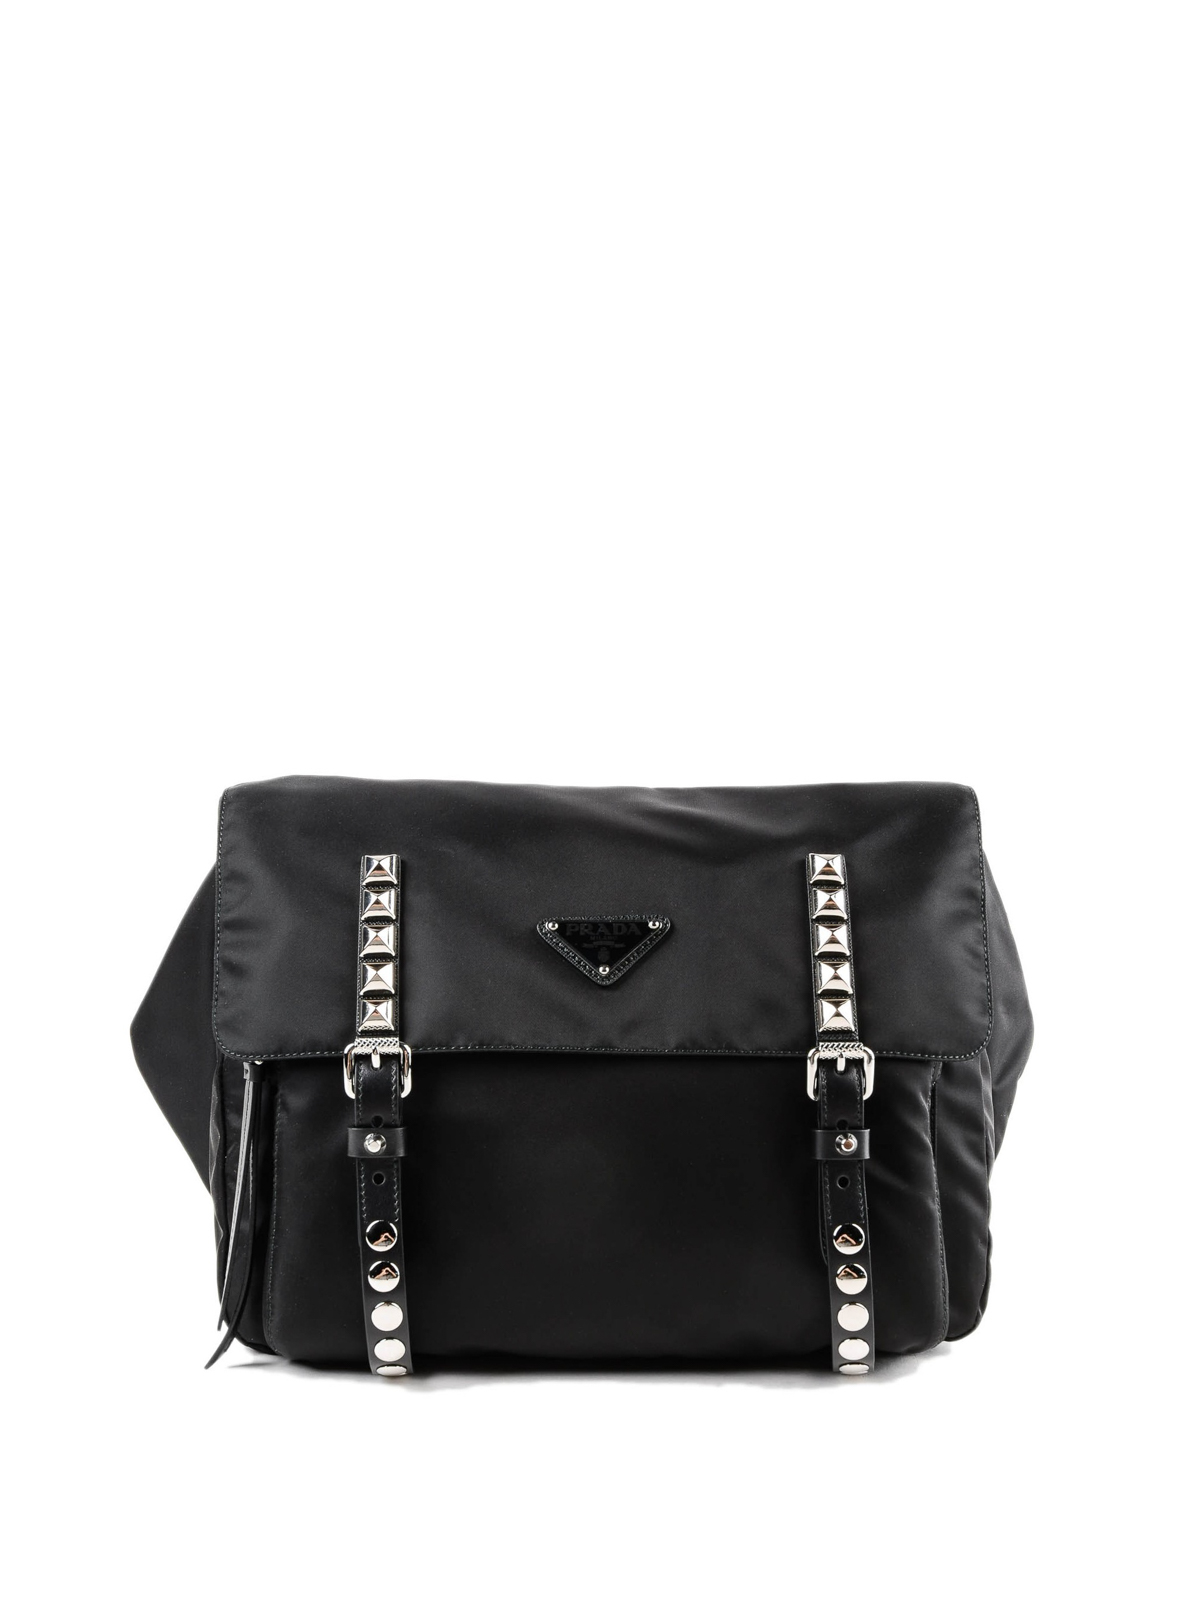 2ec10842abea Prada - Black nylon belt bag with silver studs - belt bags ...